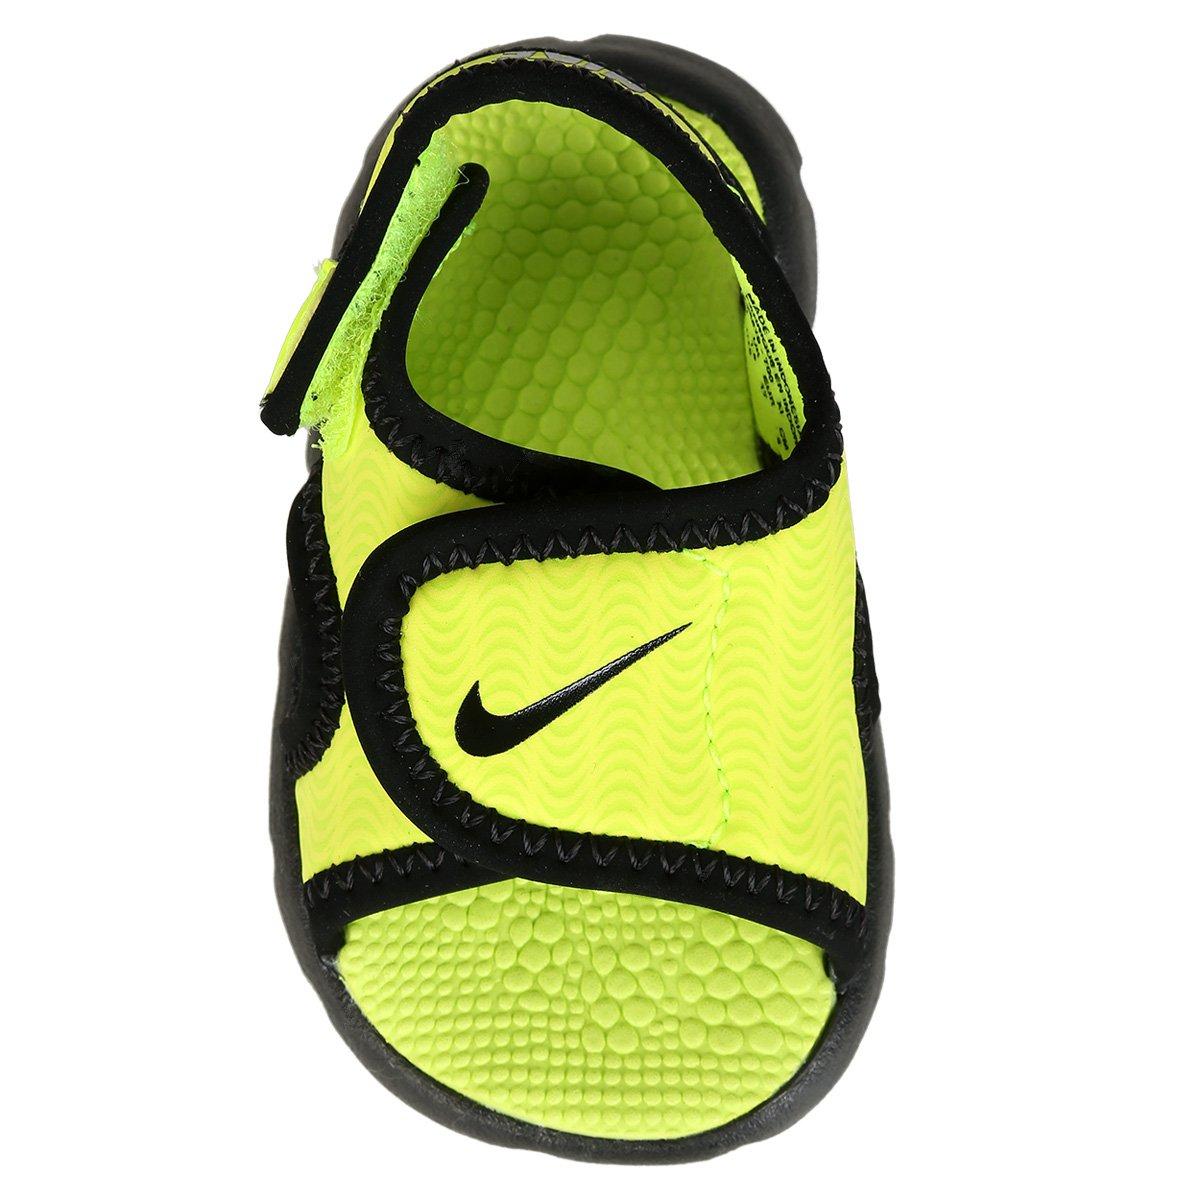 ff47e990ee Sandália Infantil Nike Sunray Adjust 4 - Tam: 24 - Shopping TudoAzul